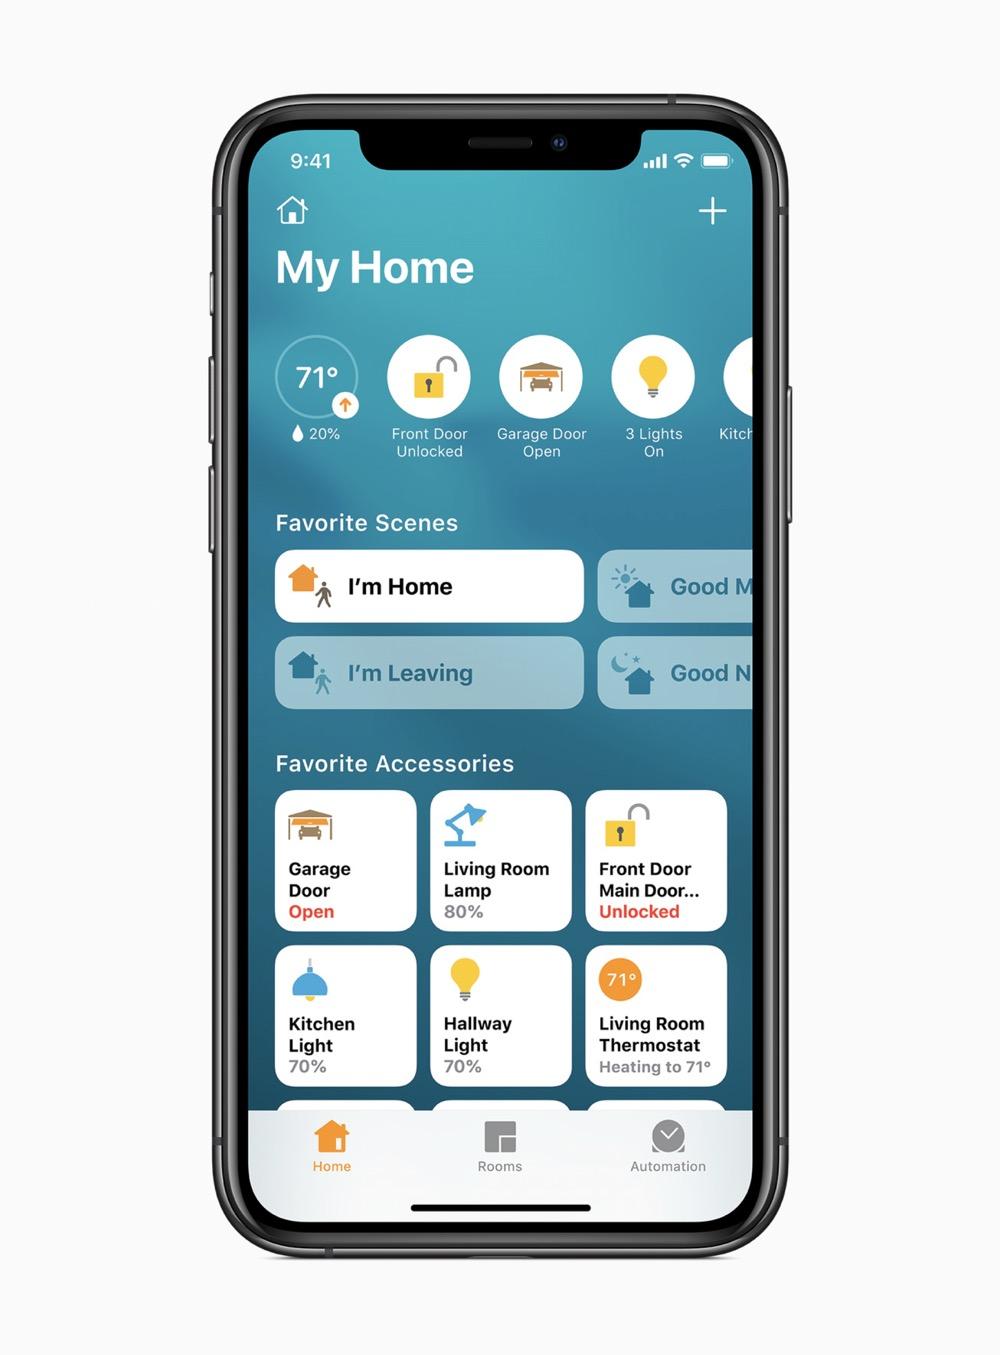 Apple ios14 my home app screen 06222020